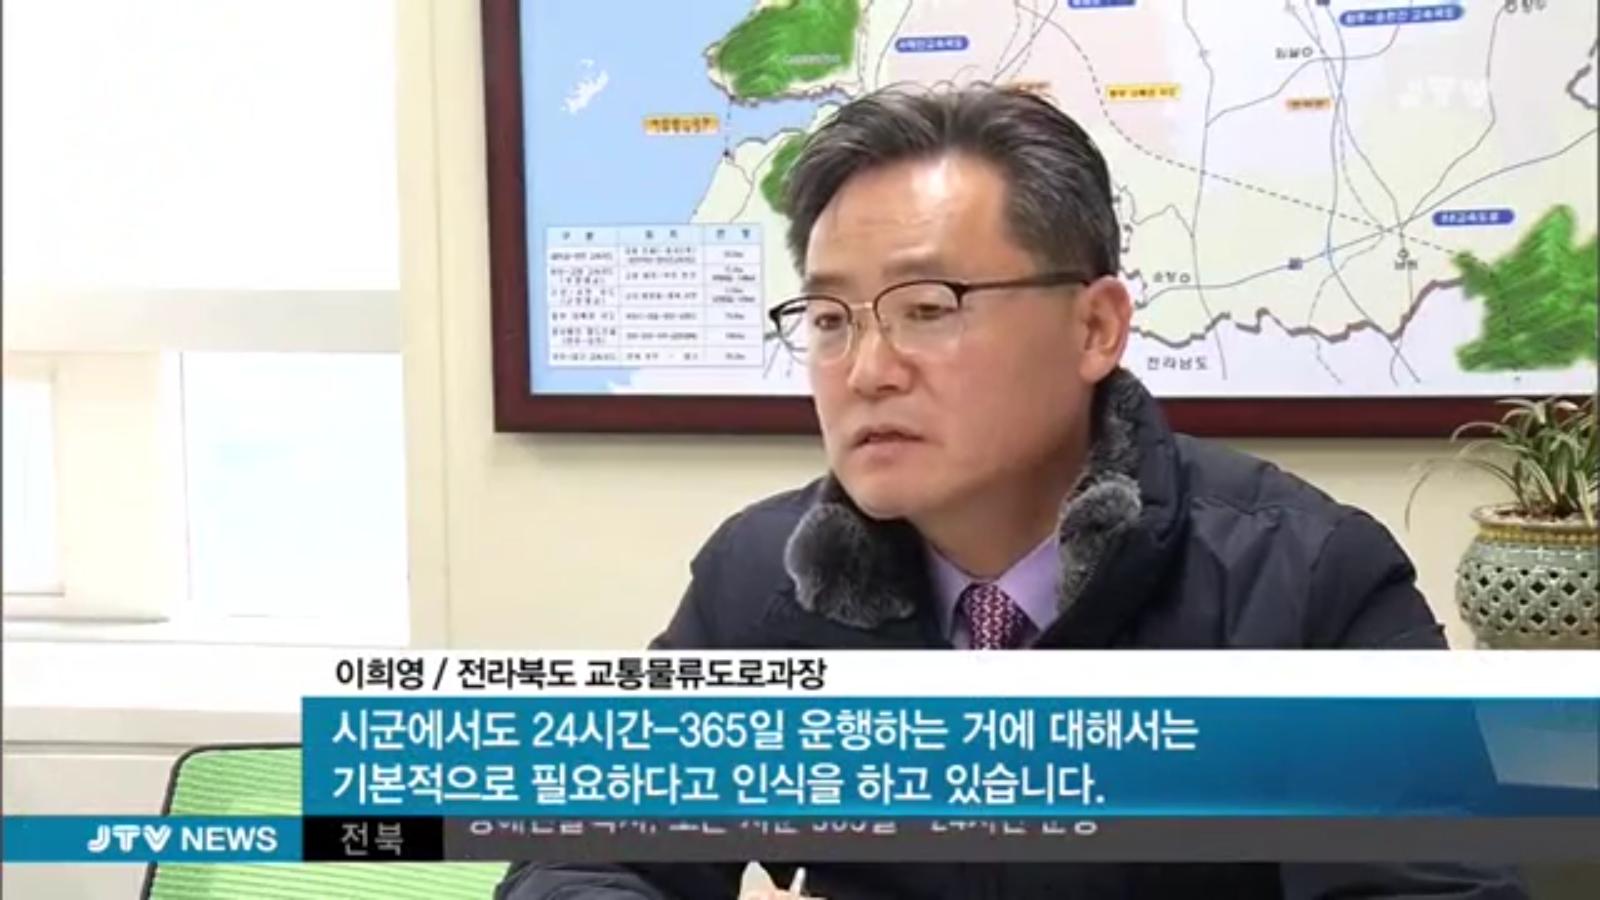 [18.1.25 JTV] 전북도, 356일 24시간 장애인콜택시 운영키로3.jpg